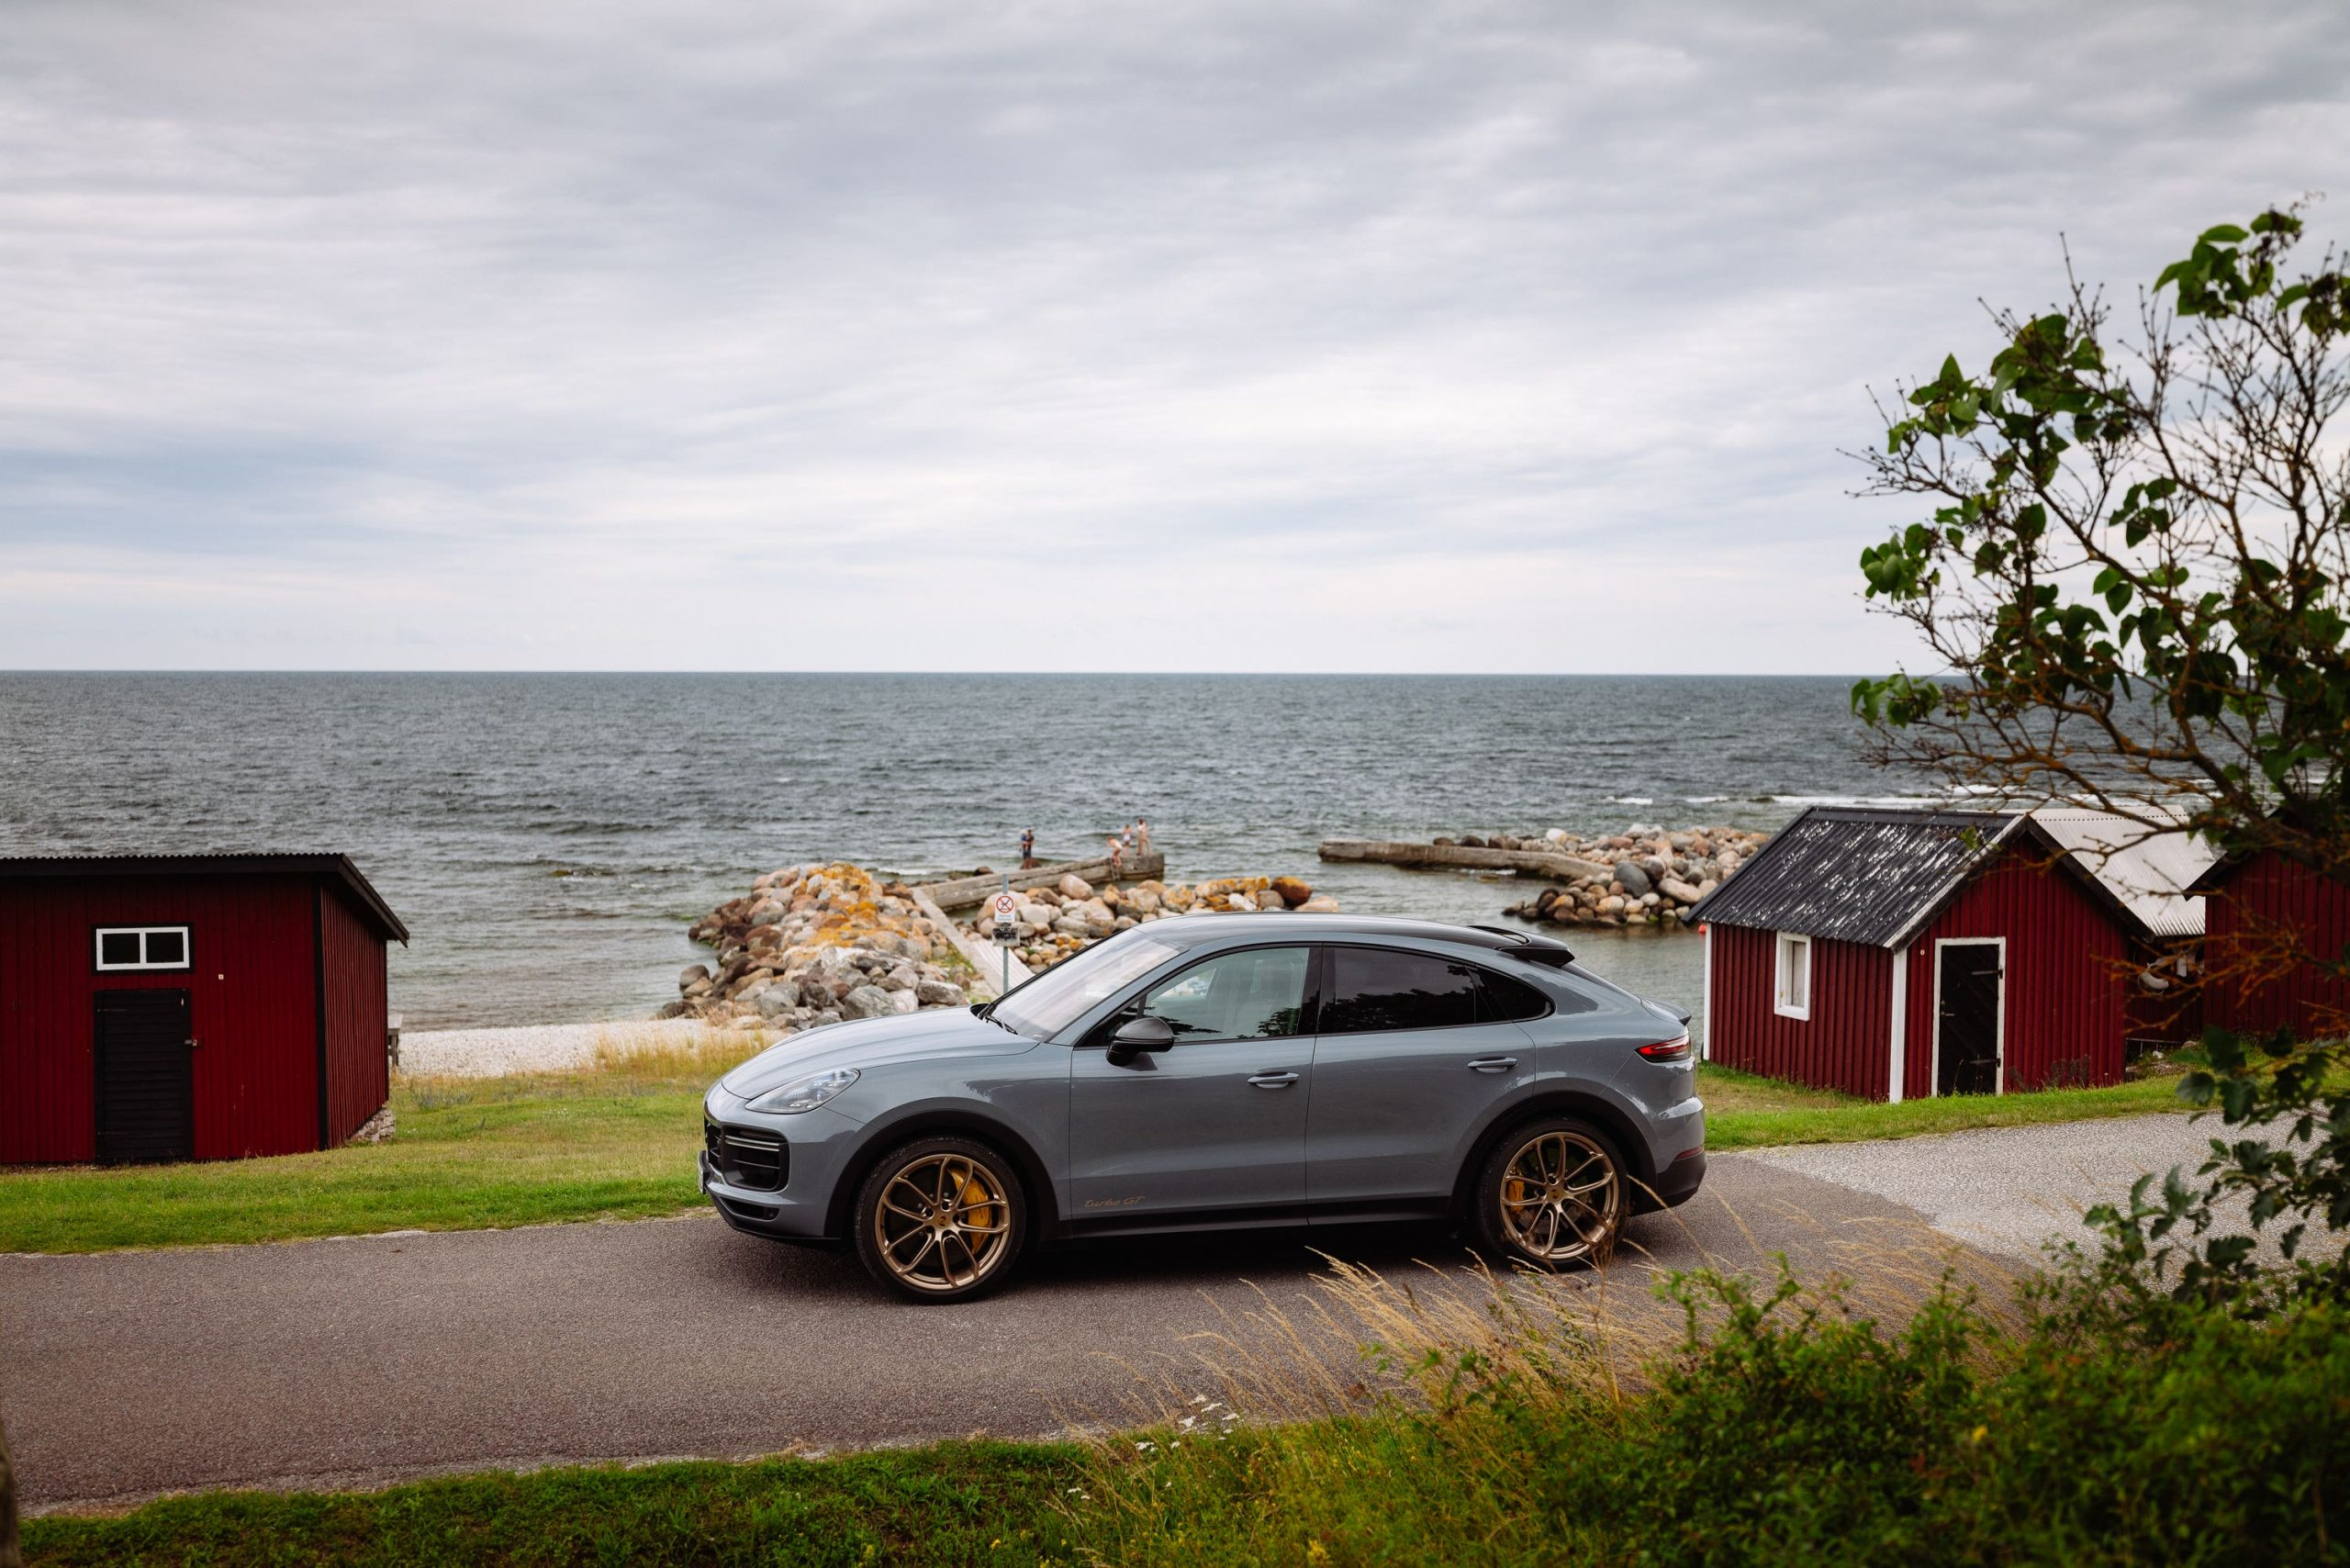 Porsche Cayenne Turbo GT beside the sea